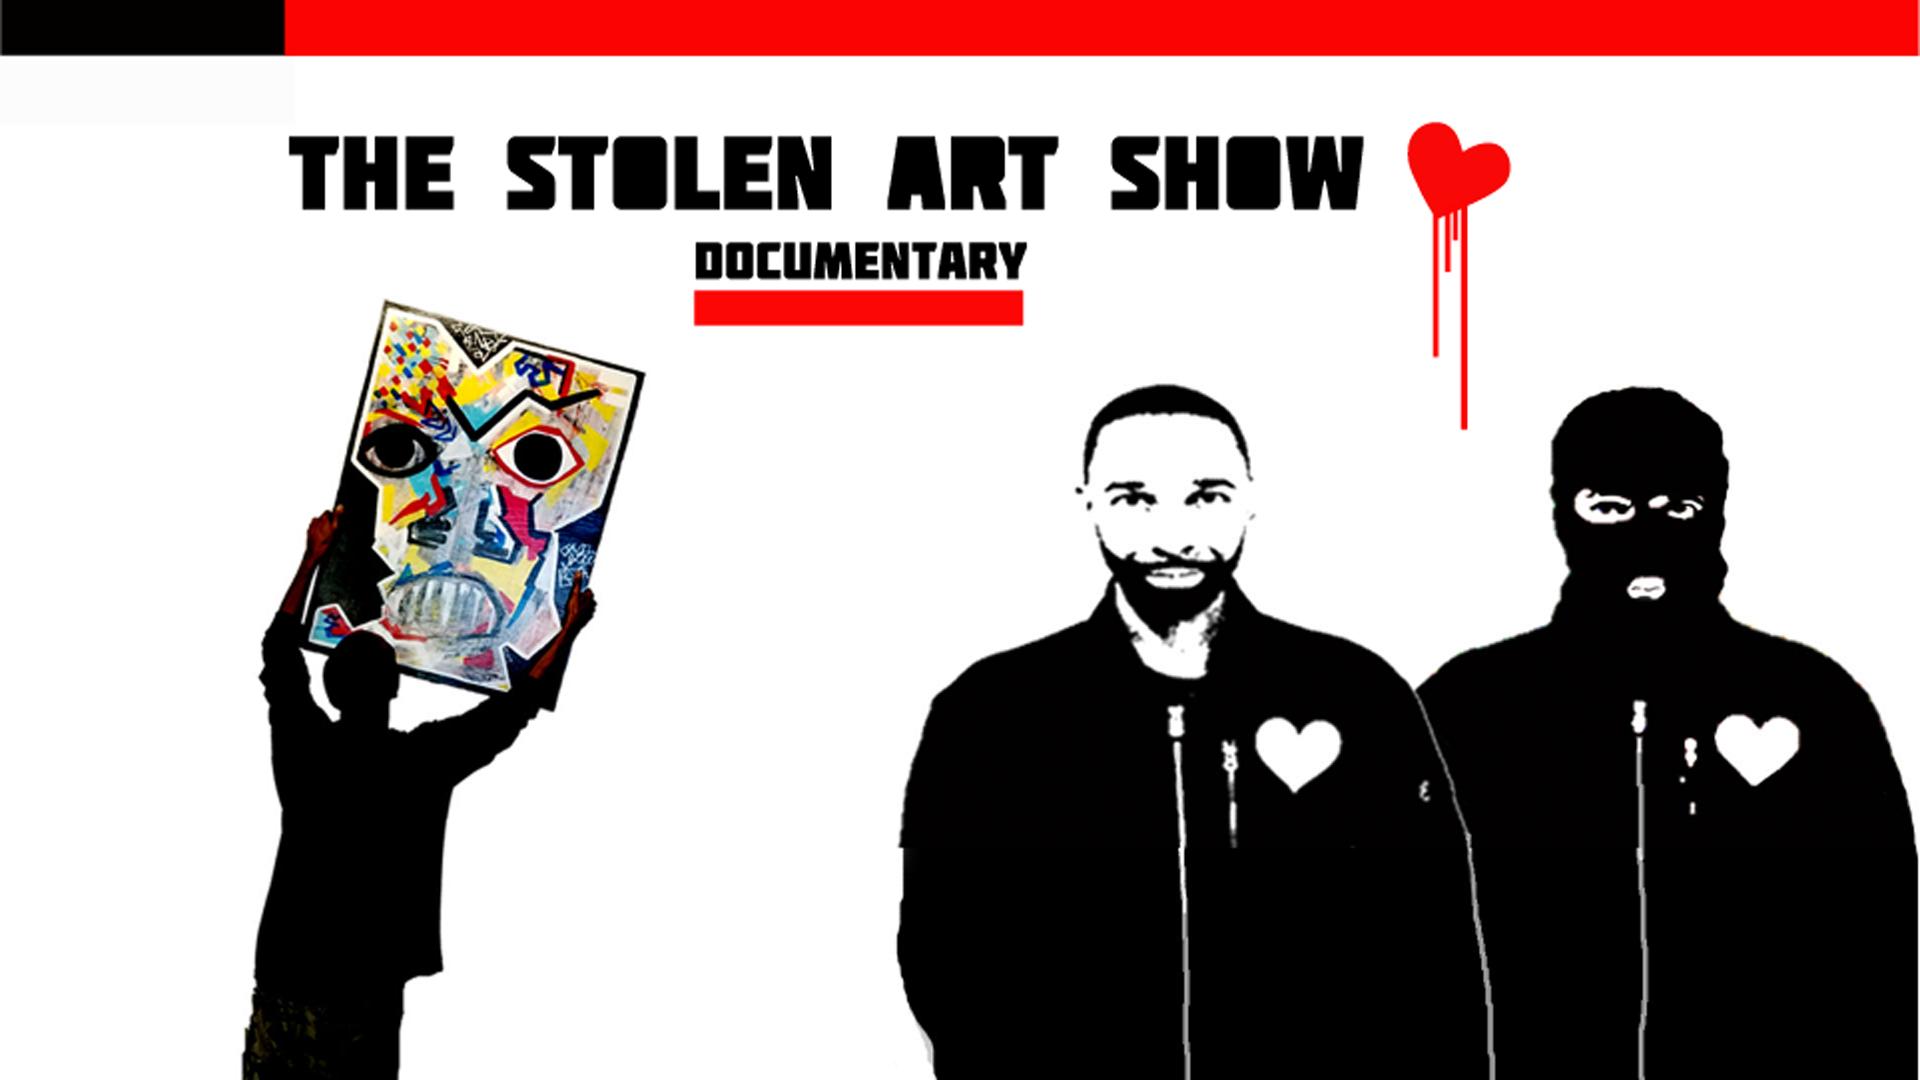 The Stolen Art Show Documentary